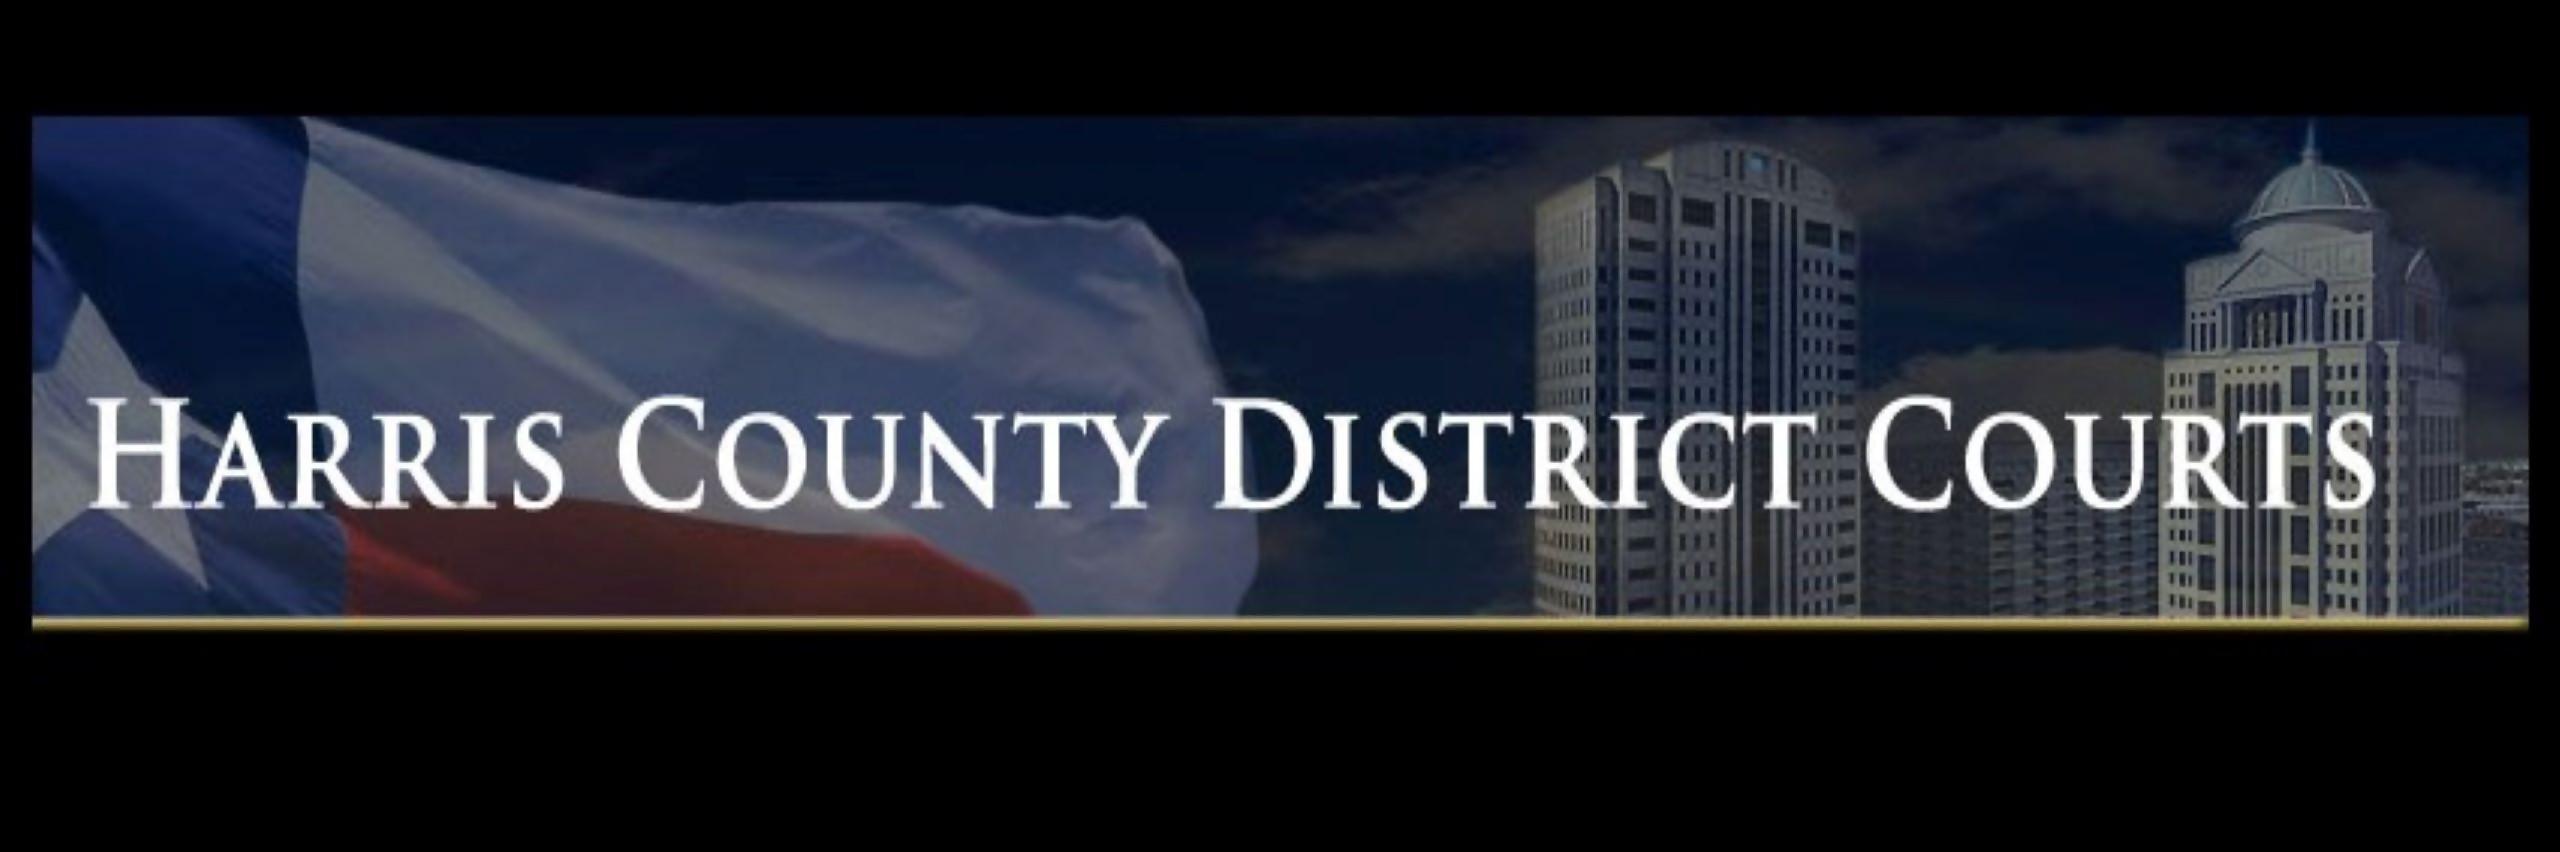 247th District Court - Live Stream